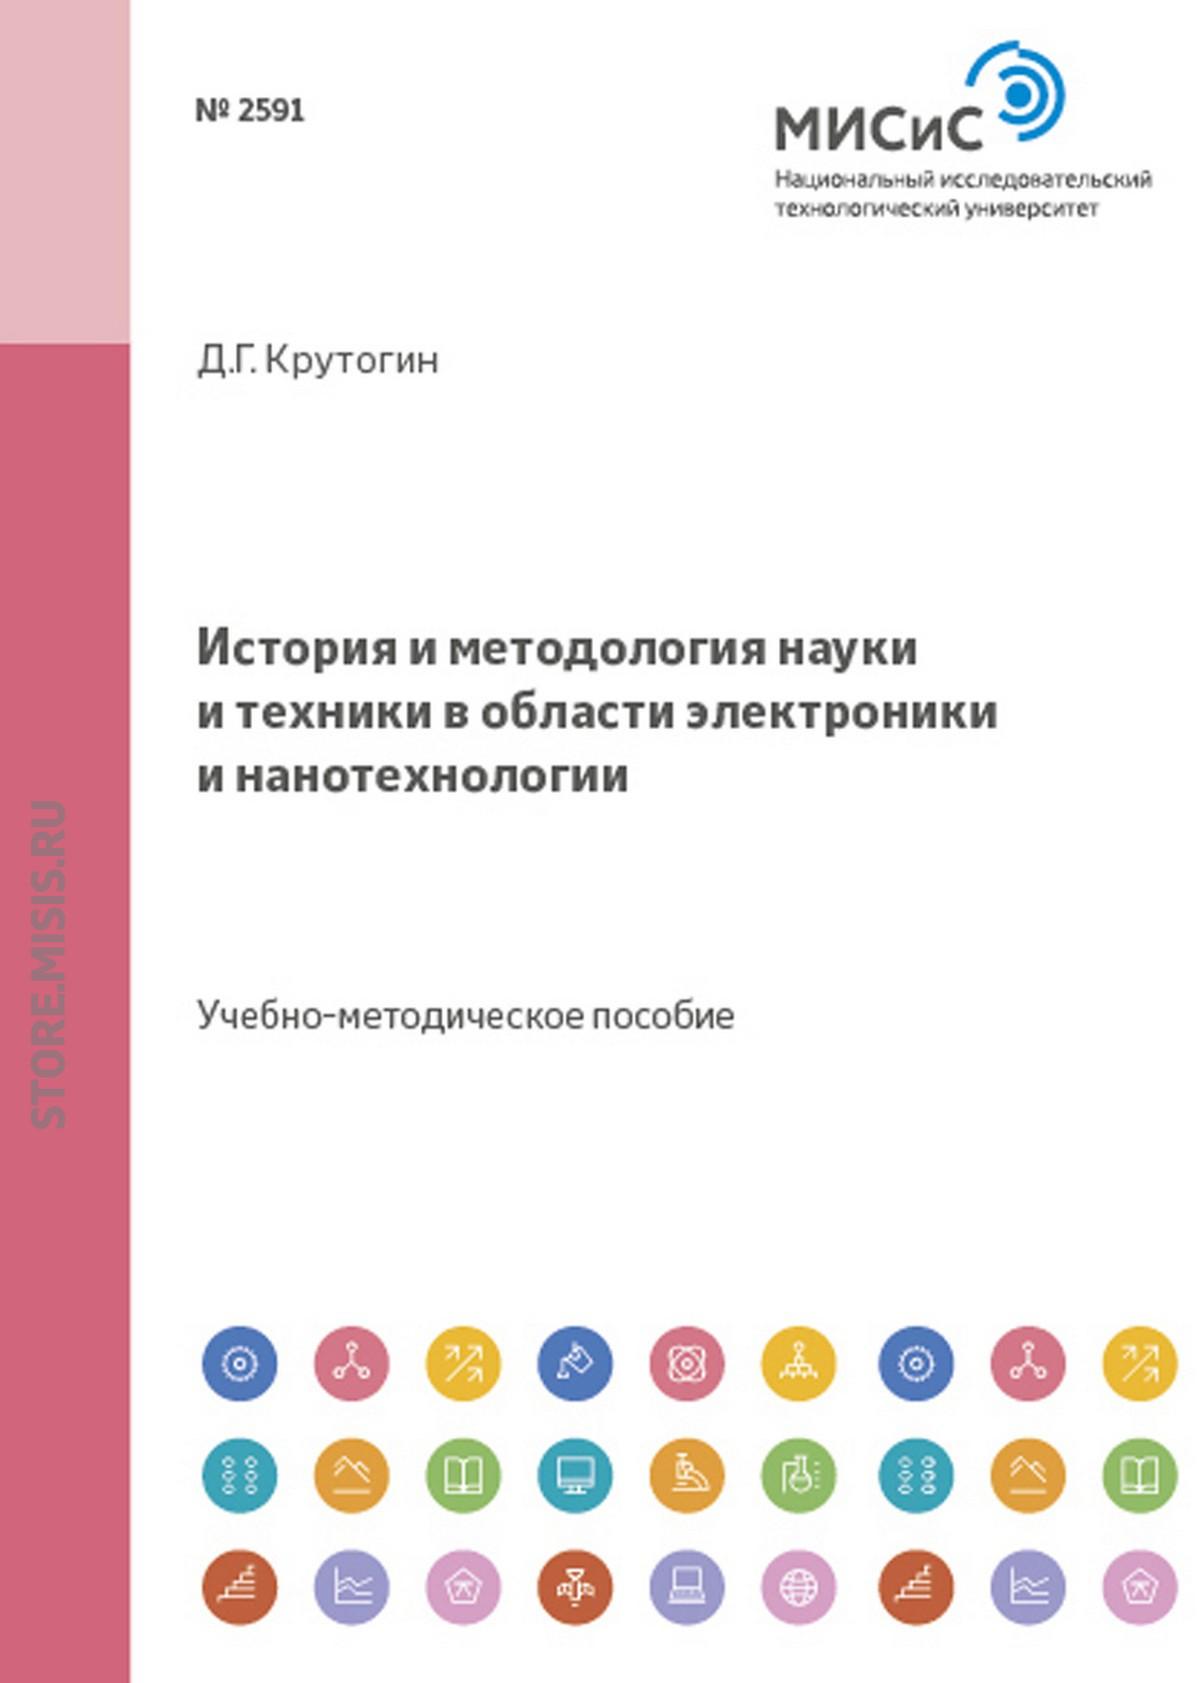 Дмитрий Крутогин История и методология науки и техники в области электроники и нанотехнологии